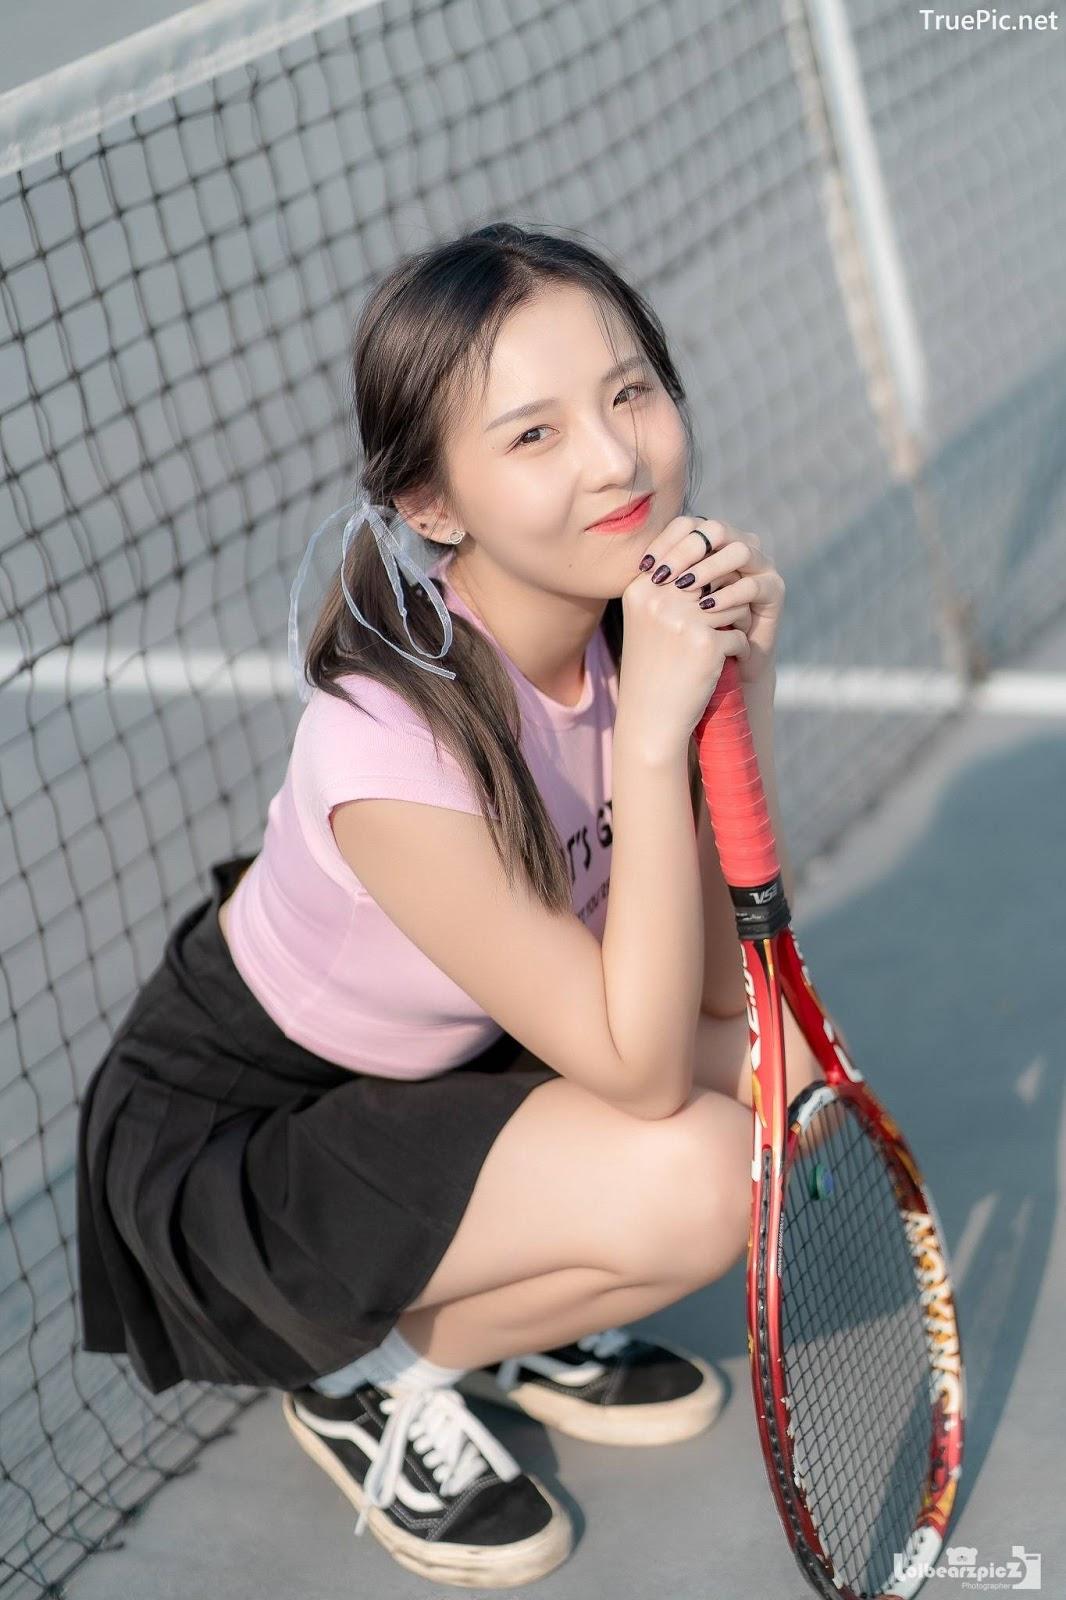 Image Thailand Model - Pattanan Truengjitrarat - Cute Sports Girl - TruePic.net - Picture-10